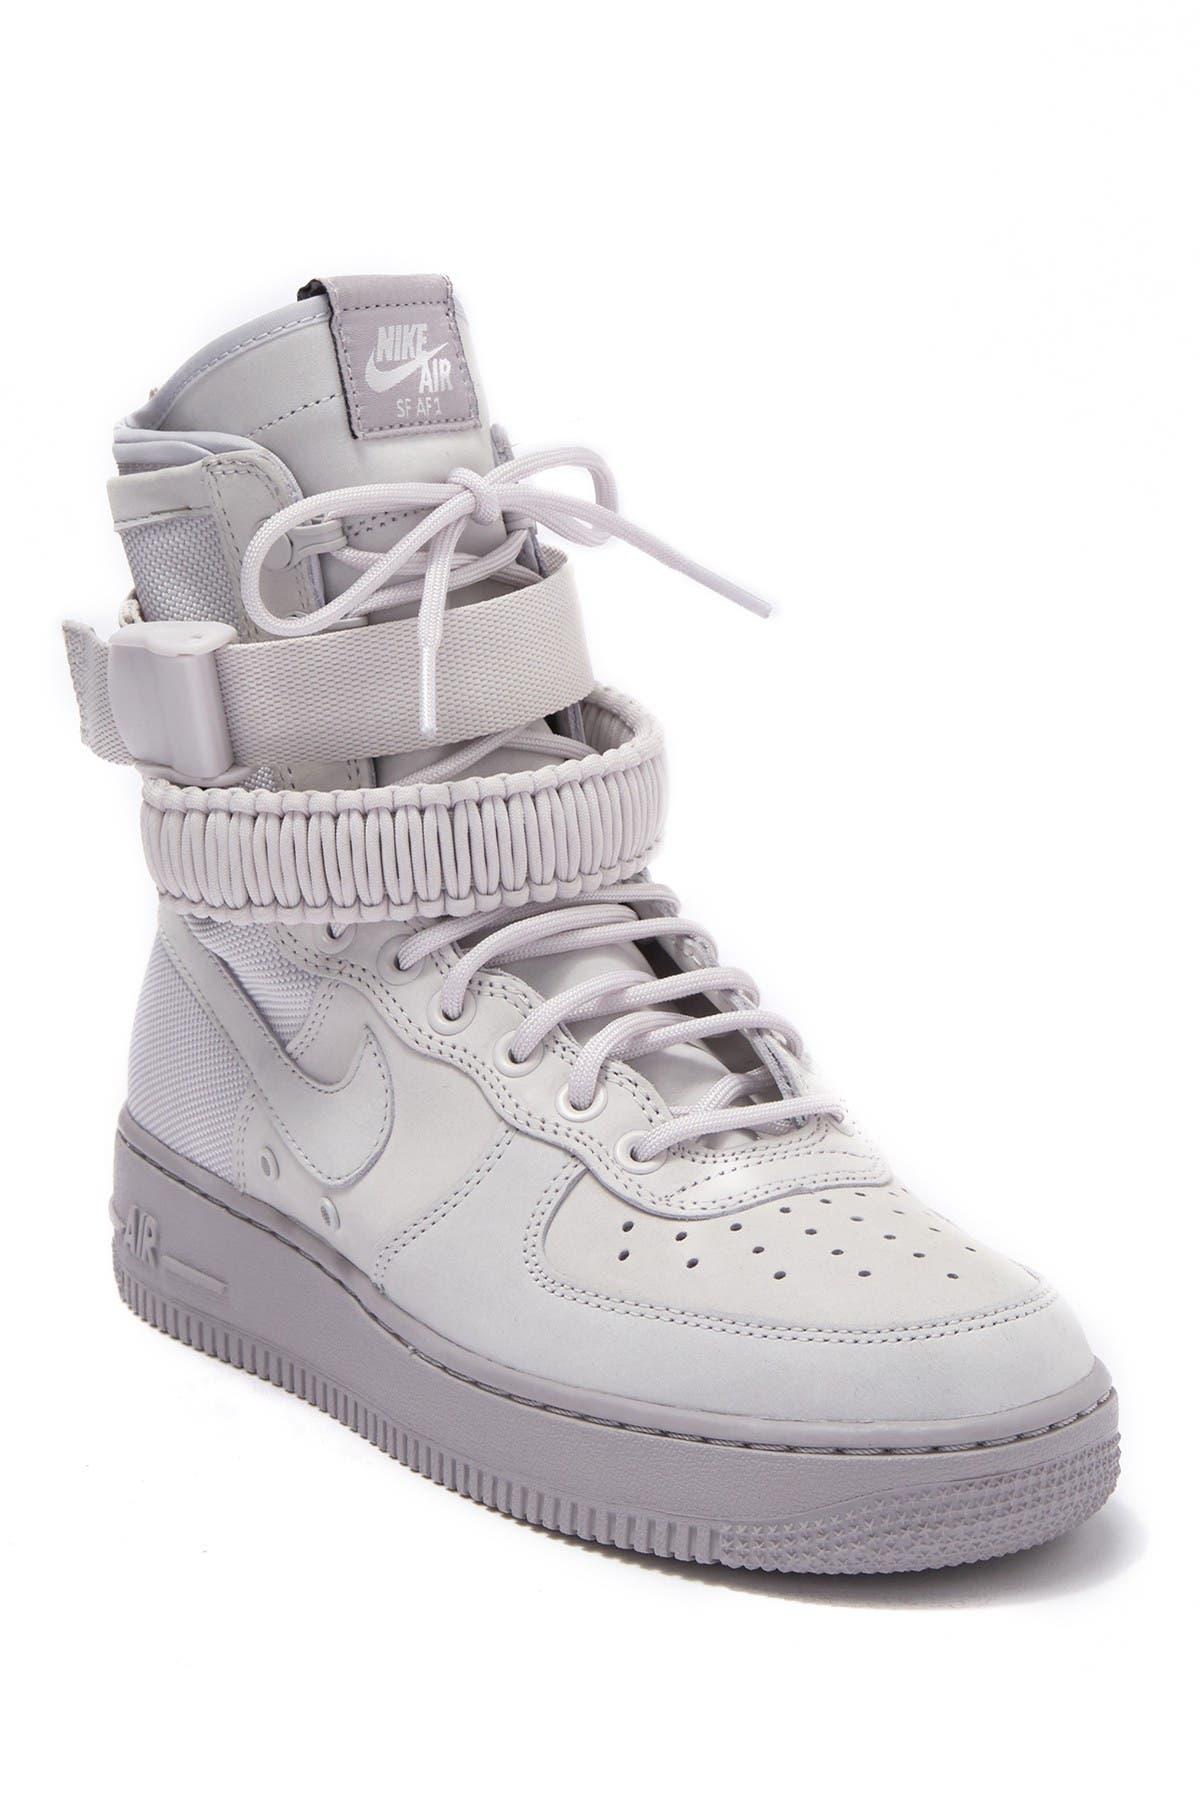 Image of Nike SF Air Force 1 Sneaker